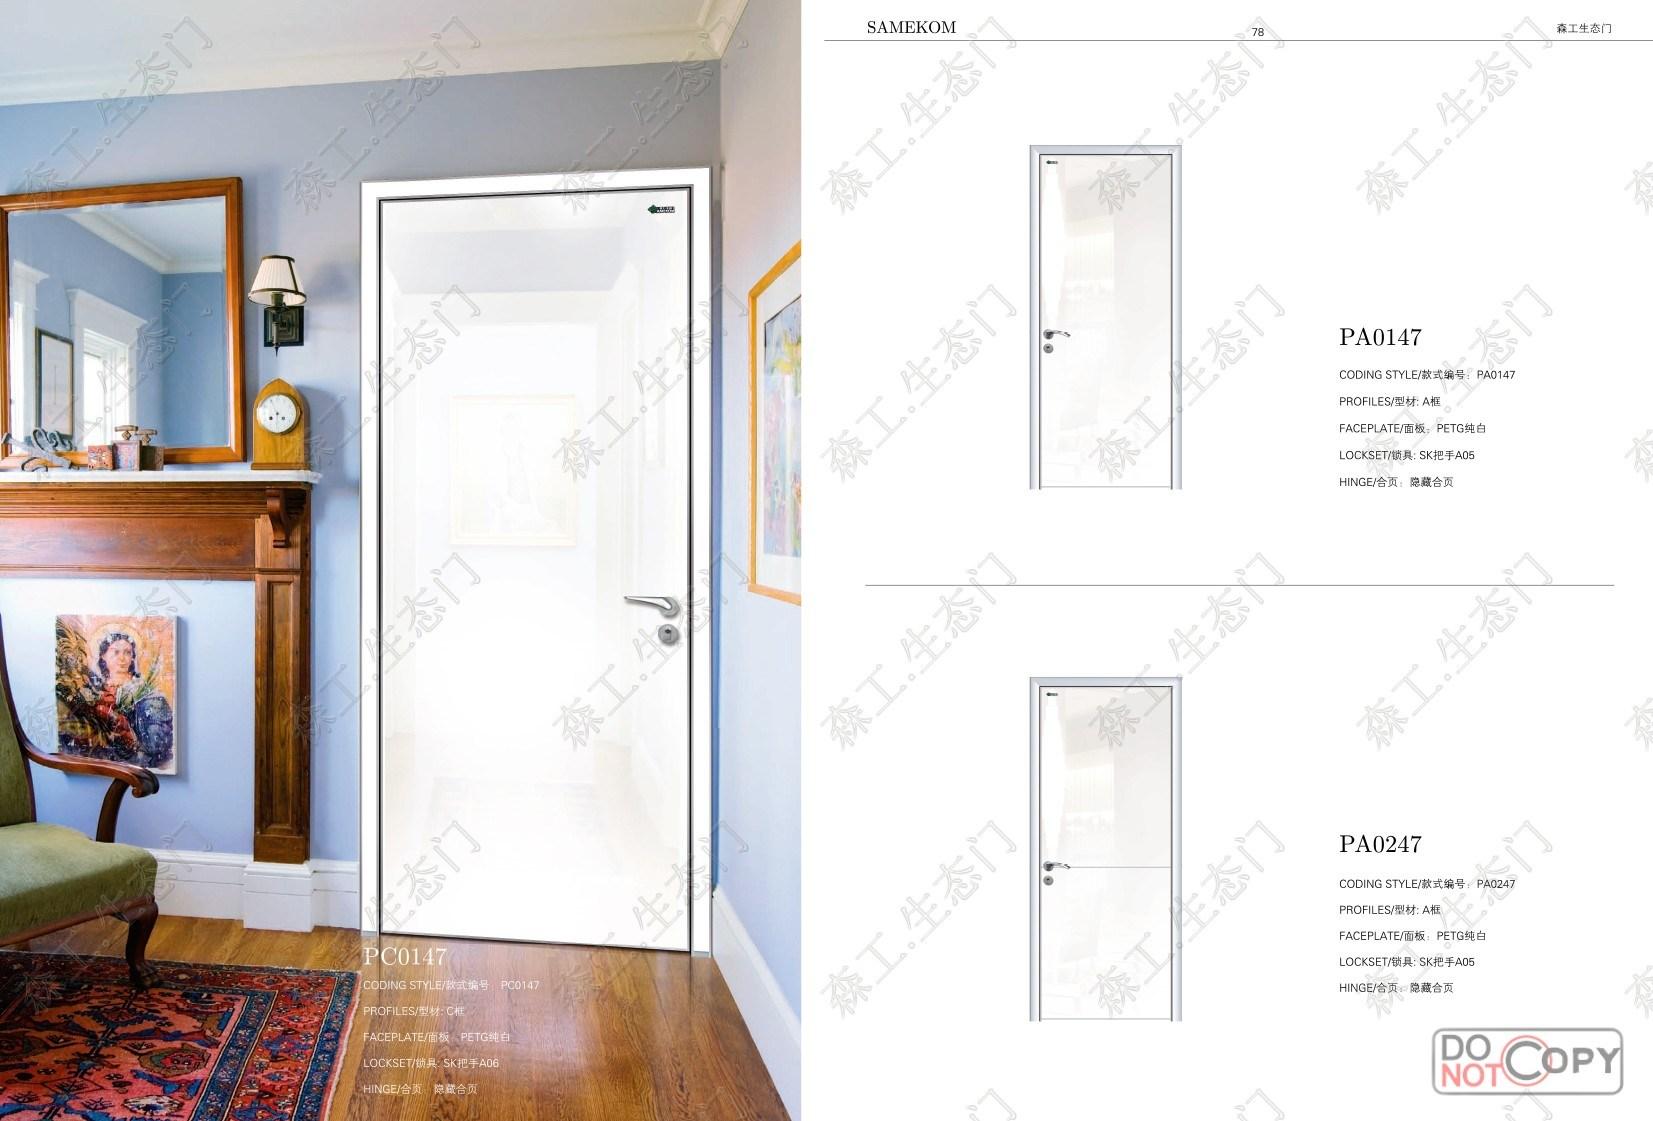 Emejing Sound Proof Apartment Photos - Home Ideas Design - cerpa.us